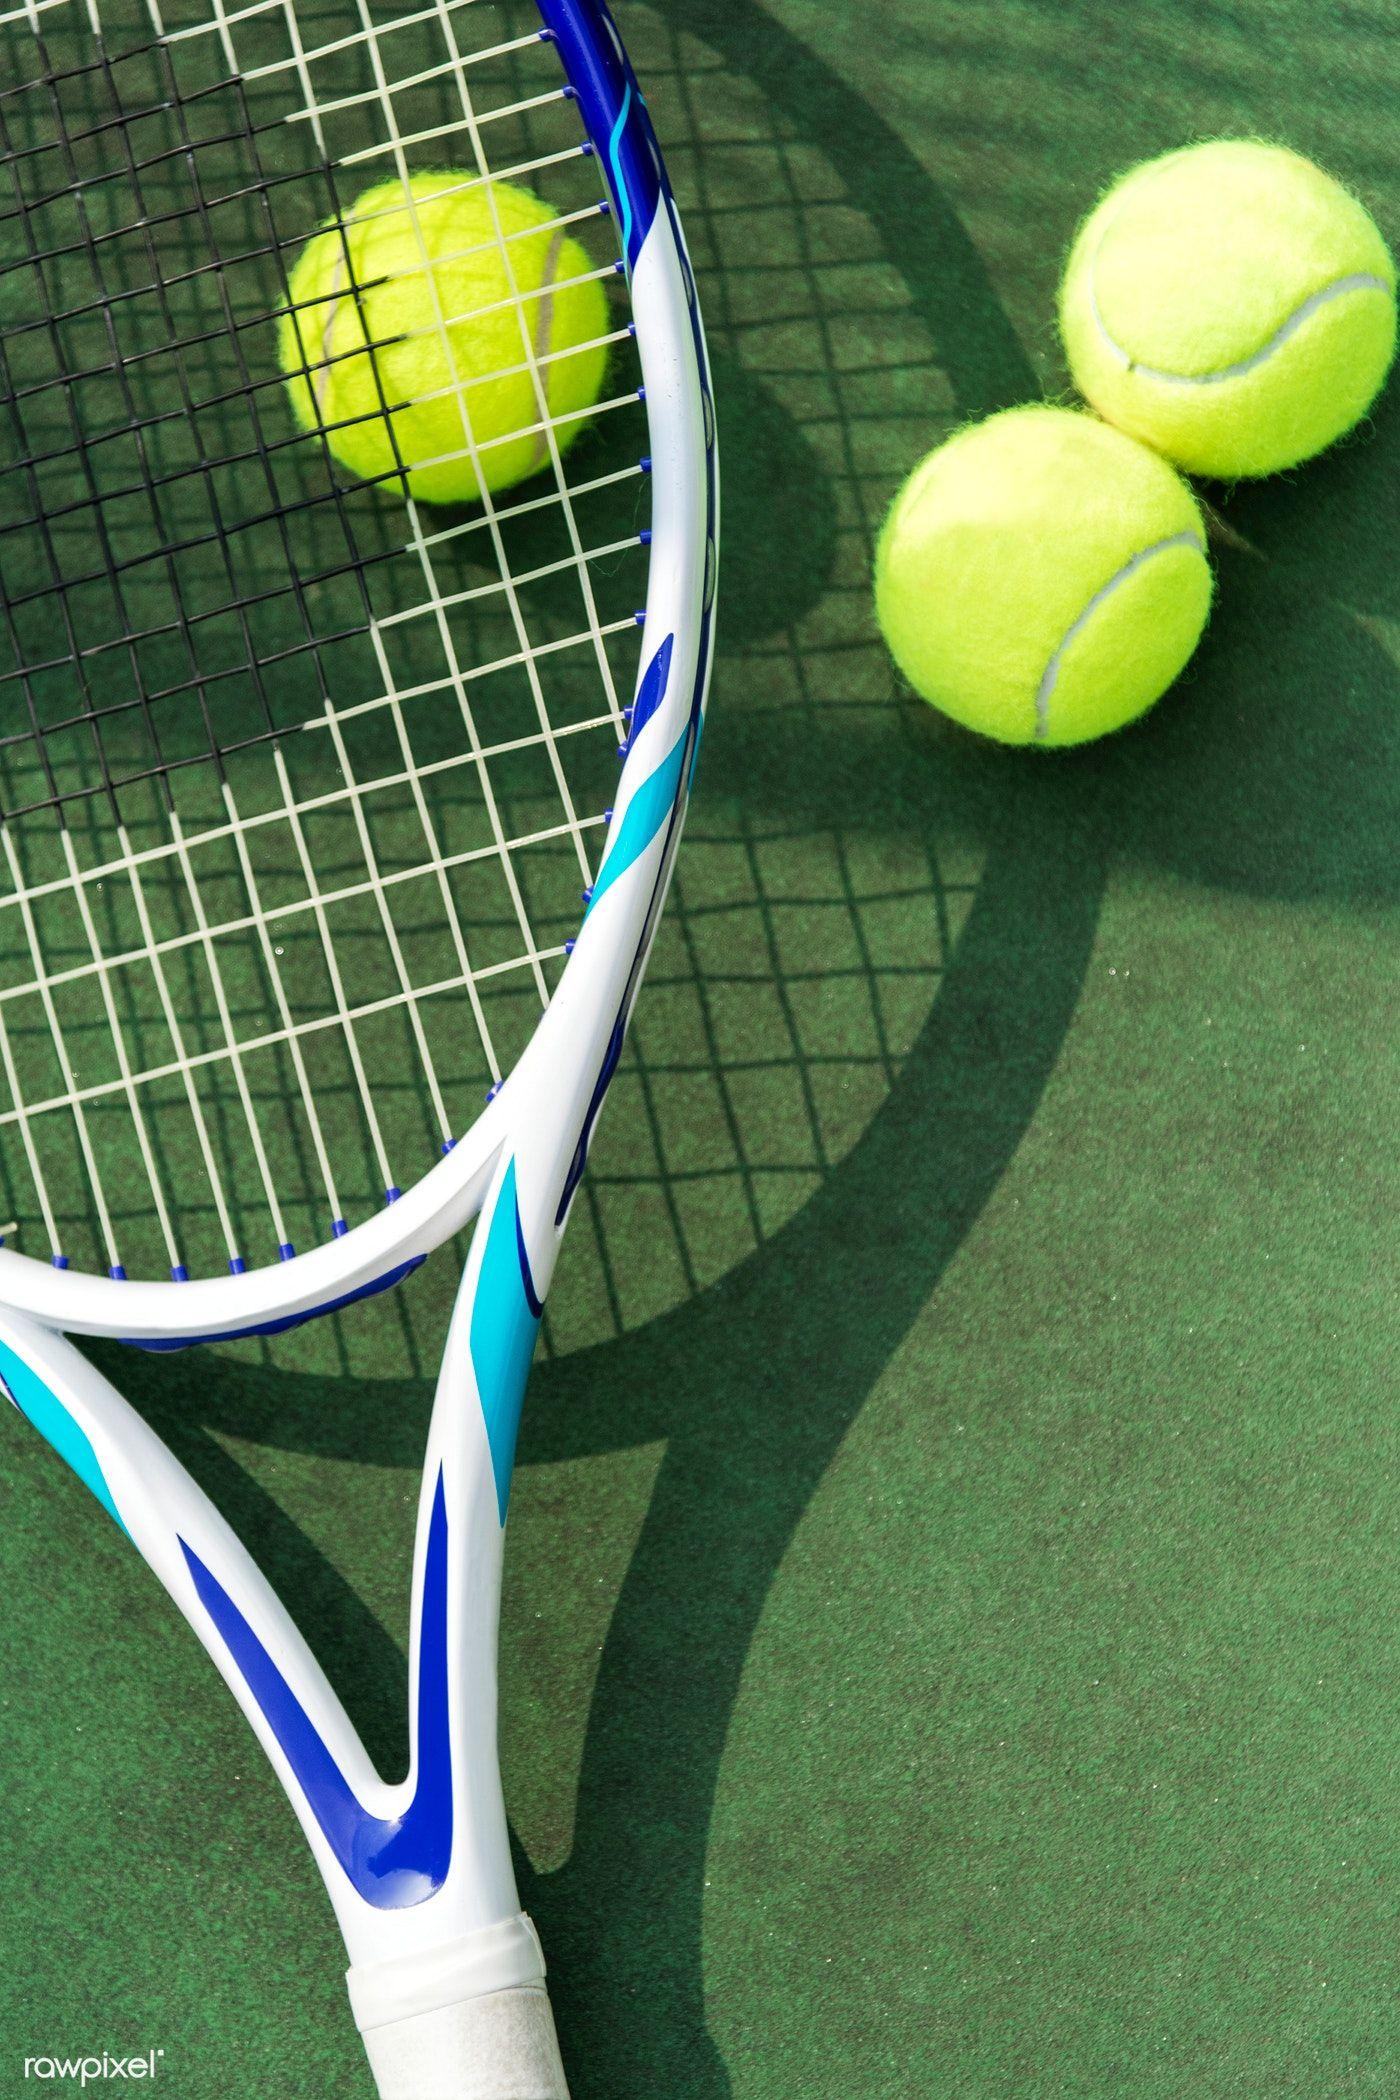 Download Premium Image Of Tennis Balls On A Tennis Court 413593 Tennis Balls Tennis Racket Tennis Wallpaper